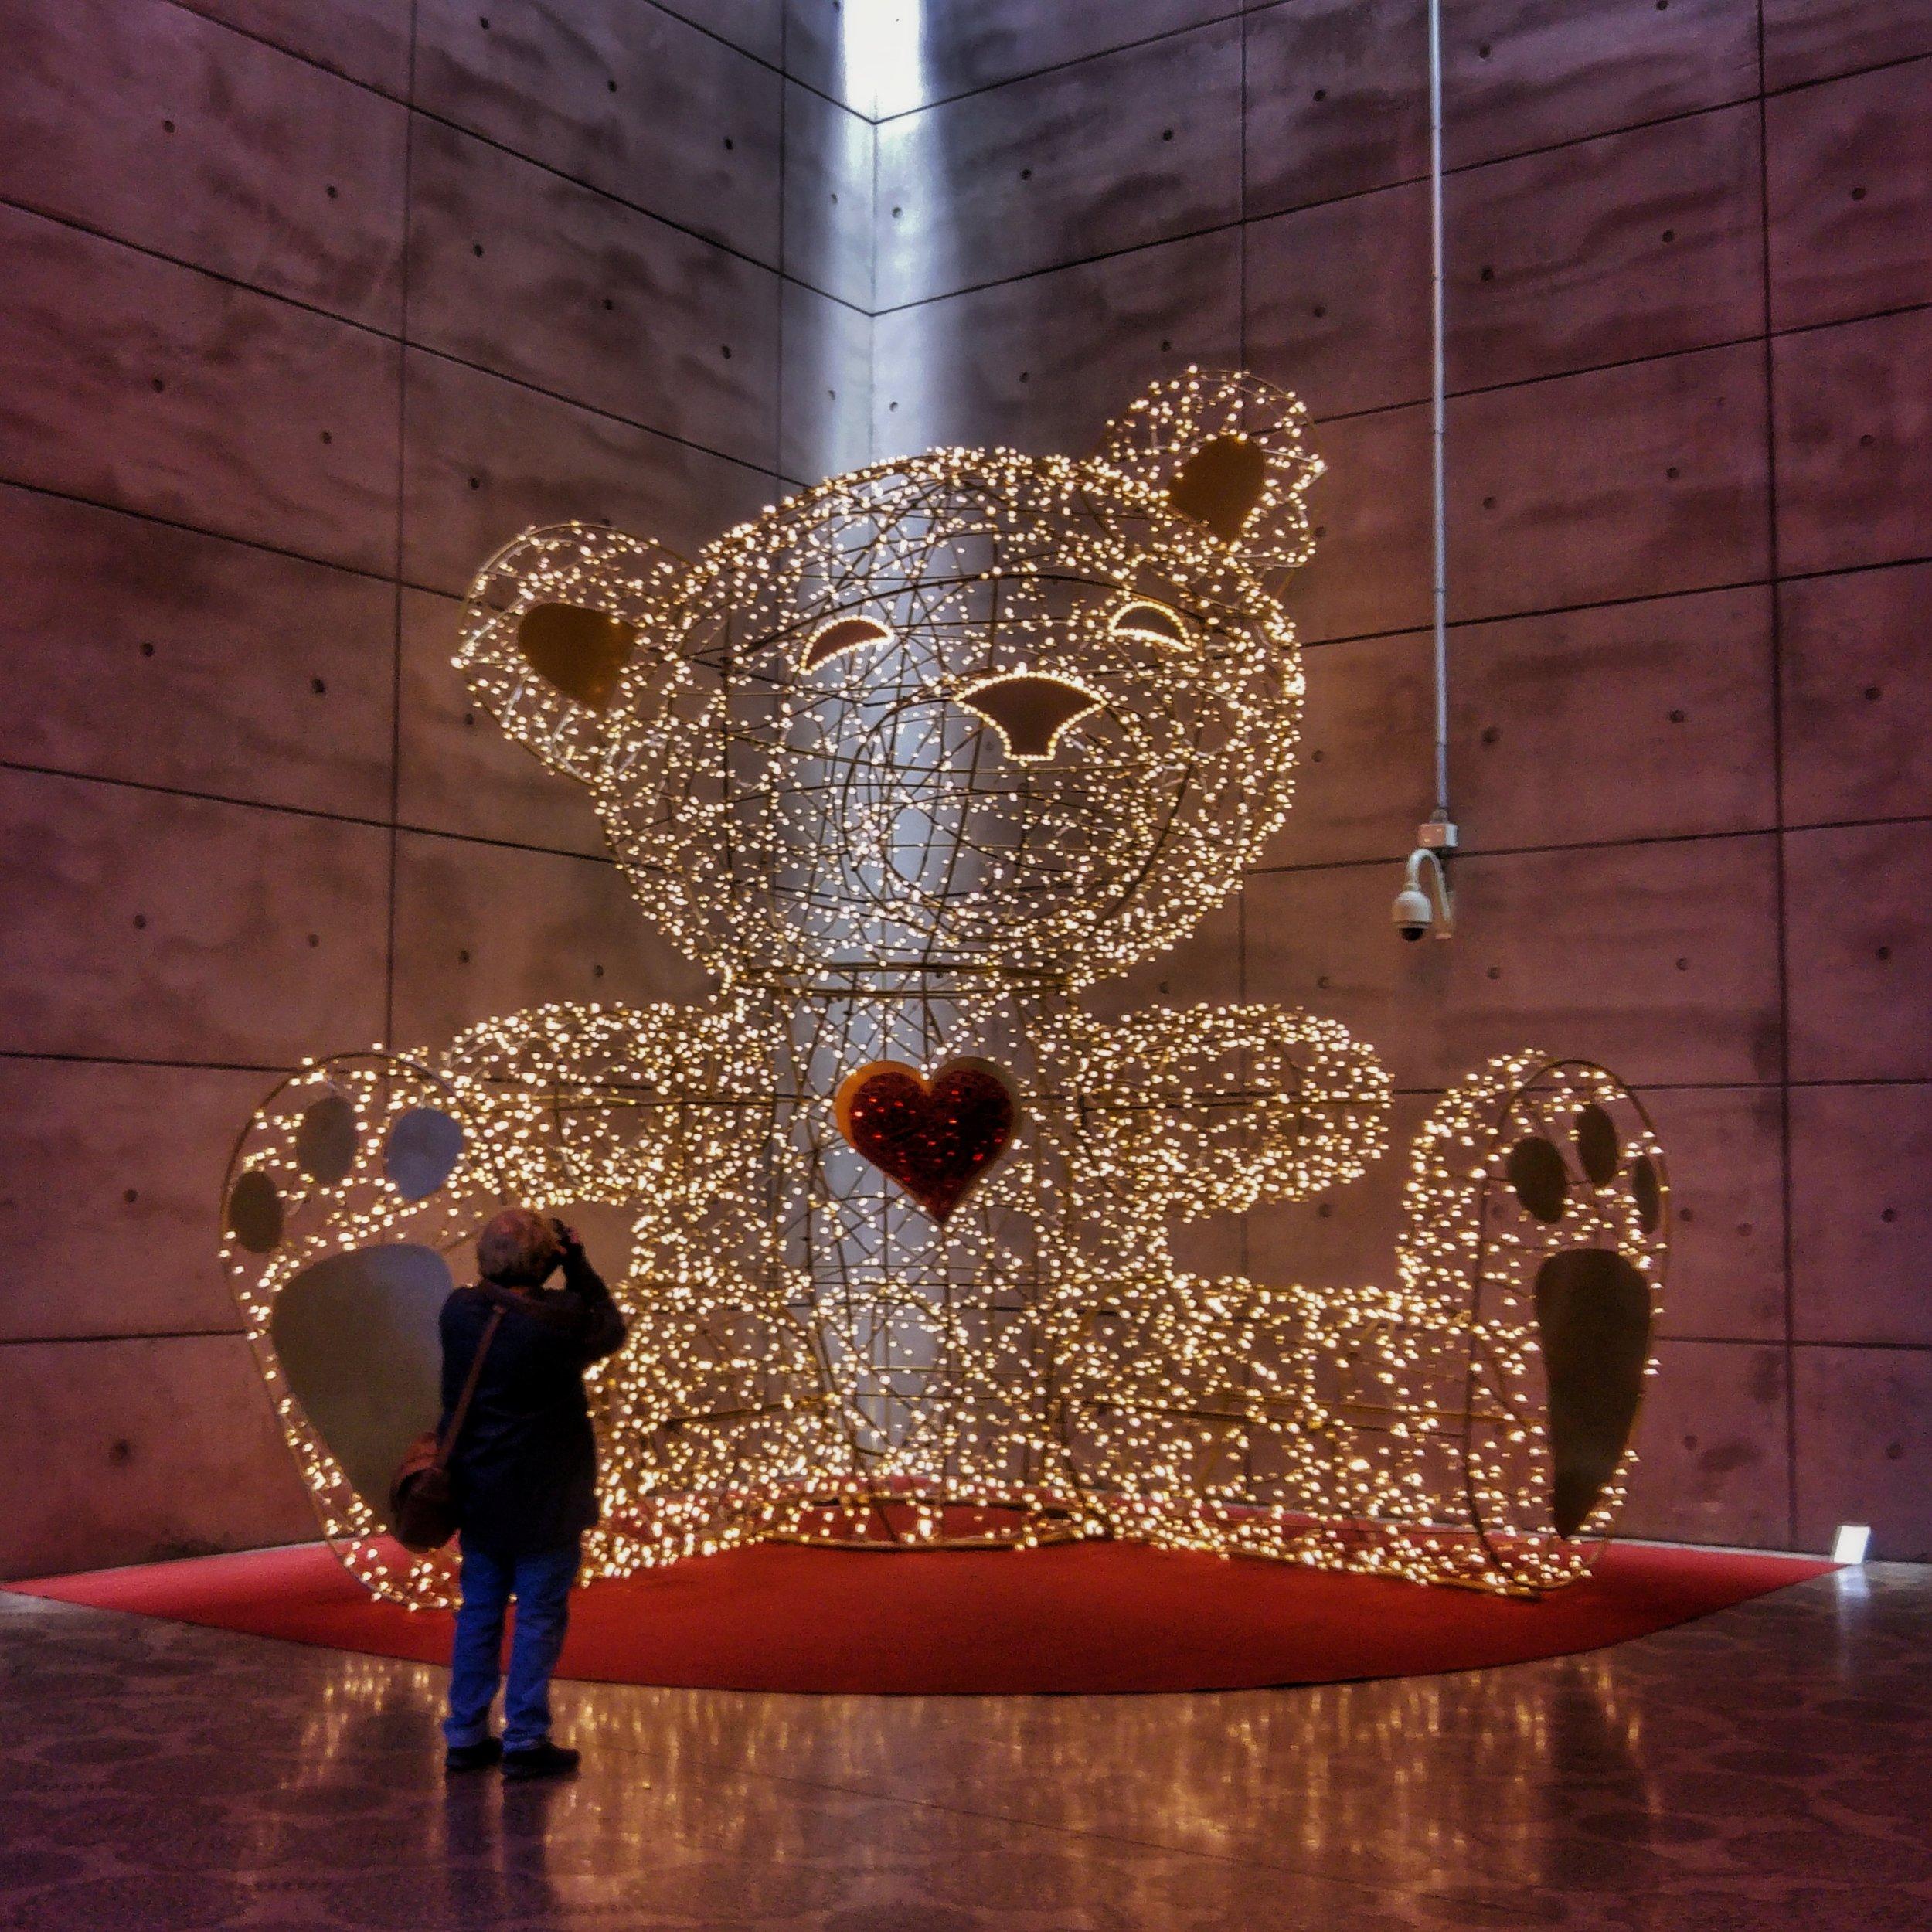 November 27 - Day 332: Christmas Teddy is back!